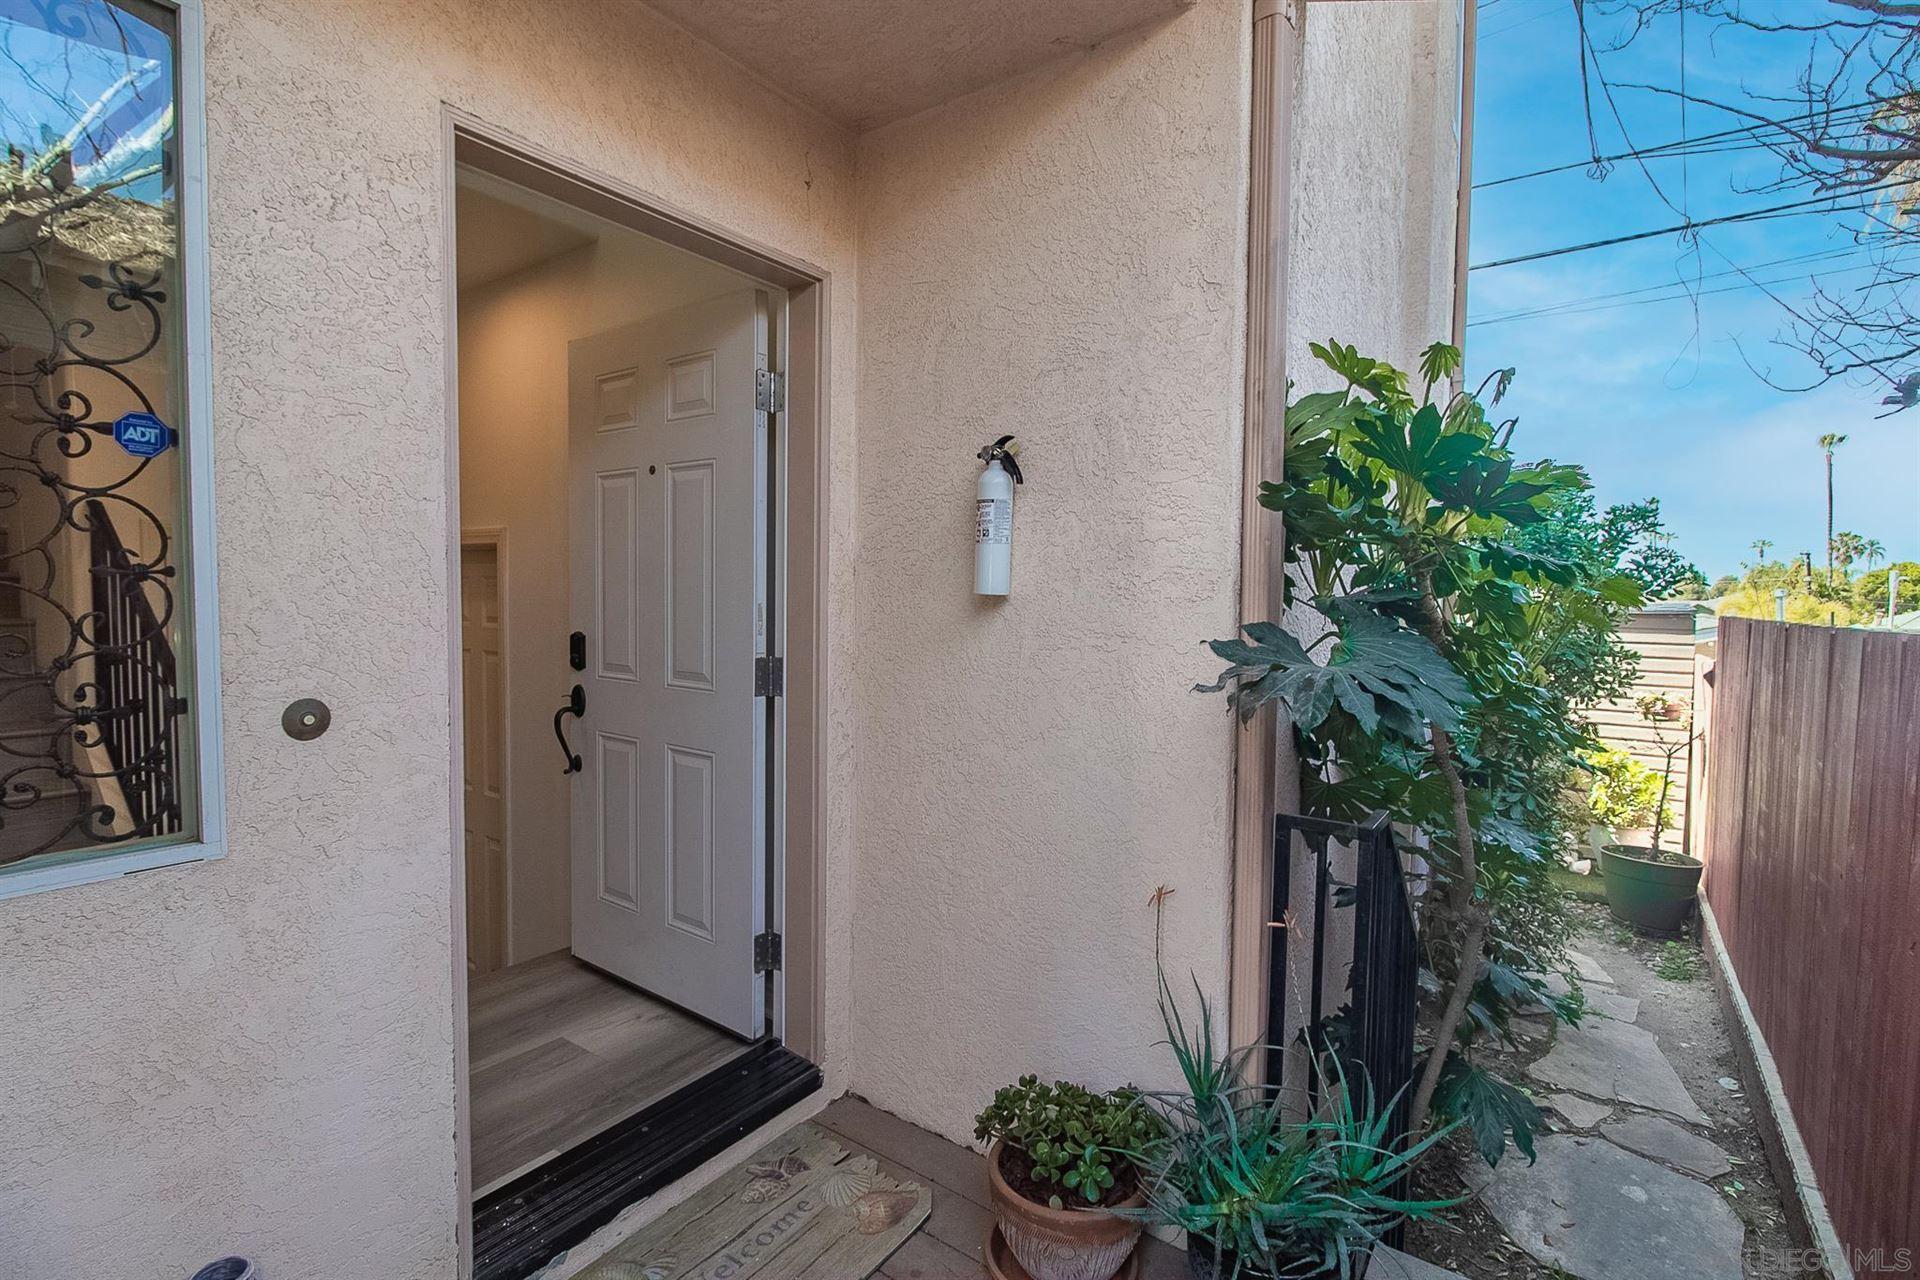 Photo for 4634 Arizona St, San Diego, CA 92116 (MLS # 210008438)